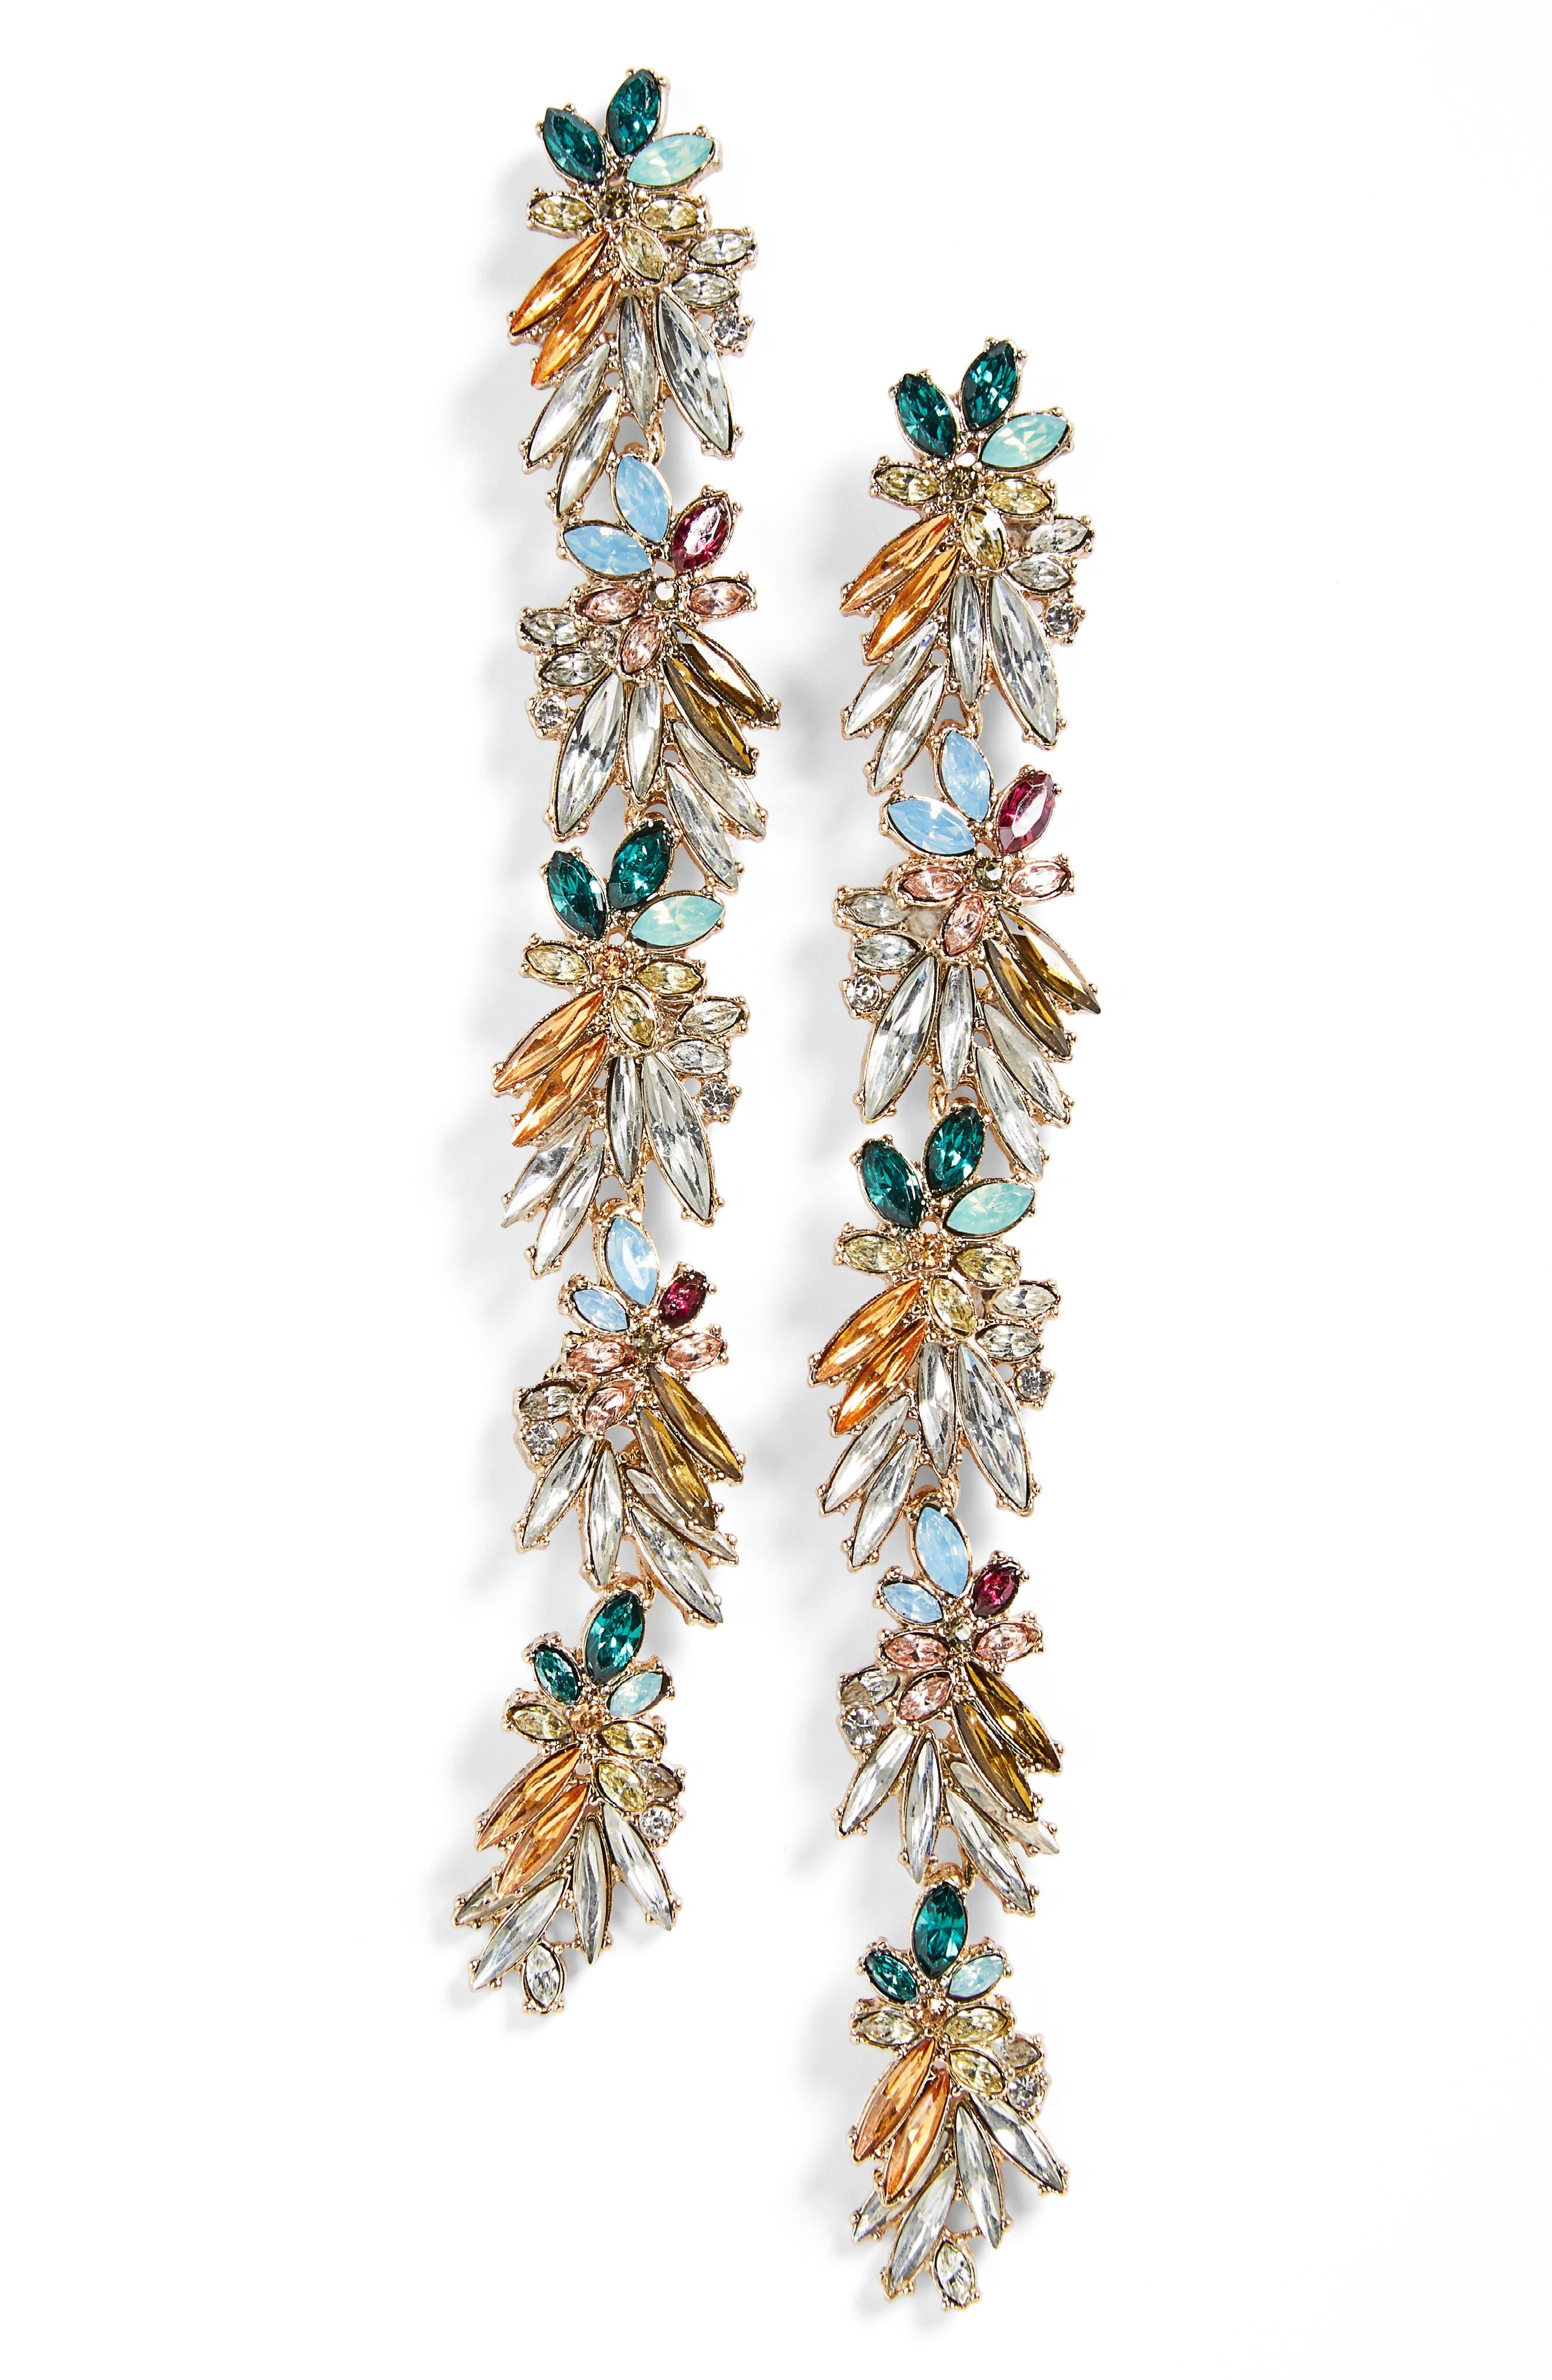 Shoulder Duster Earrings,                             Main thumbnail 1, color,                             400